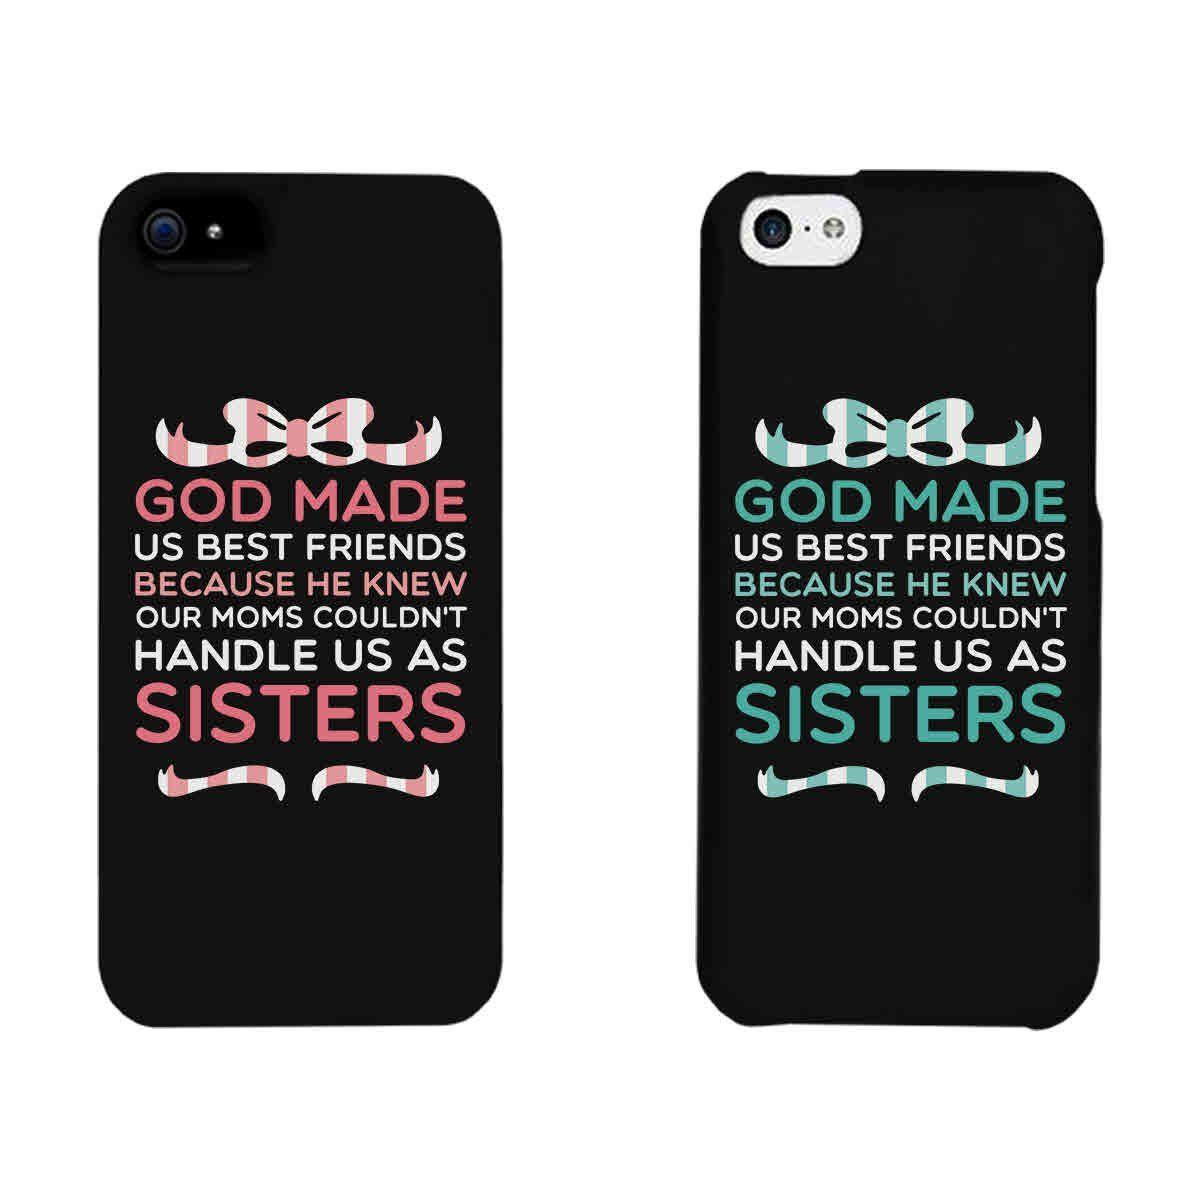 24b23efe6e Cute BFF Phone Cases - God Made Us Best Friends Phone Covers for iphone 4,  iphone 5, iphone 5C, iphone 6, iphone 6 plus, Galaxy S3, Galaxy S4, Galaxy  S5, ...